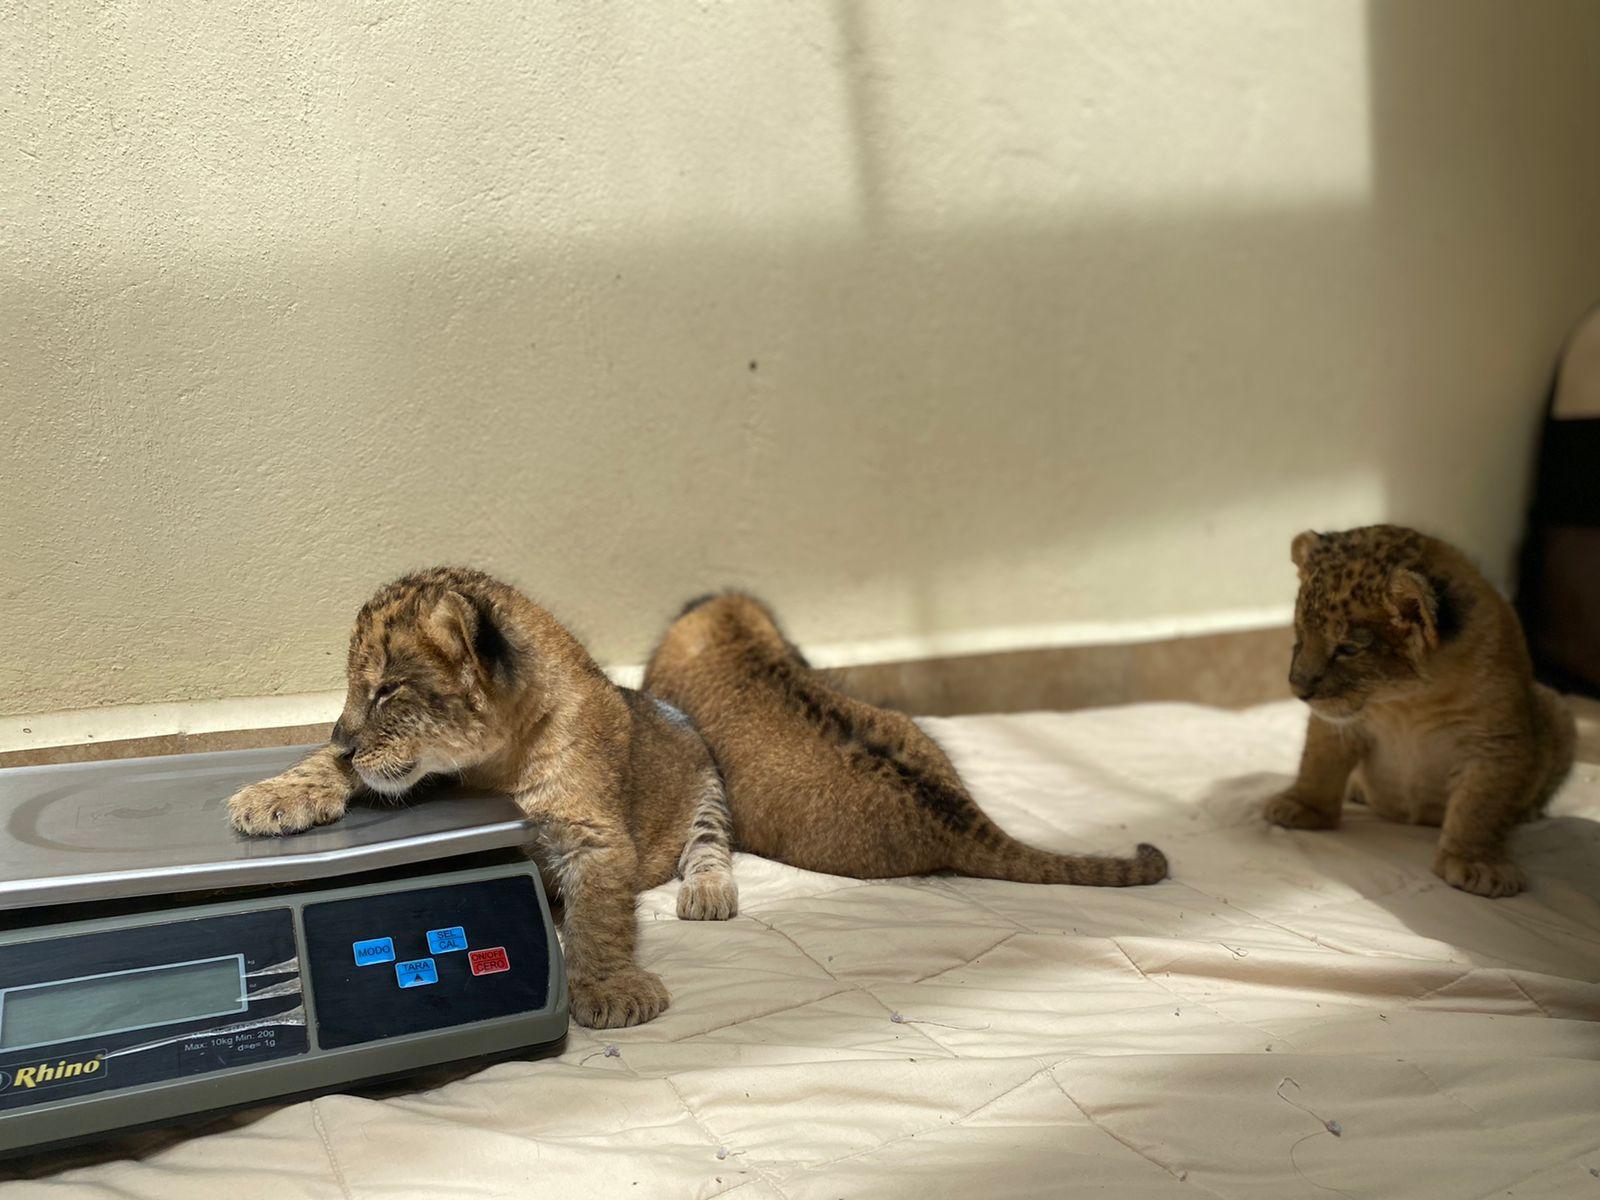 Crían de forma artificial a tres felinos en Zacango - Ago 30, 2021